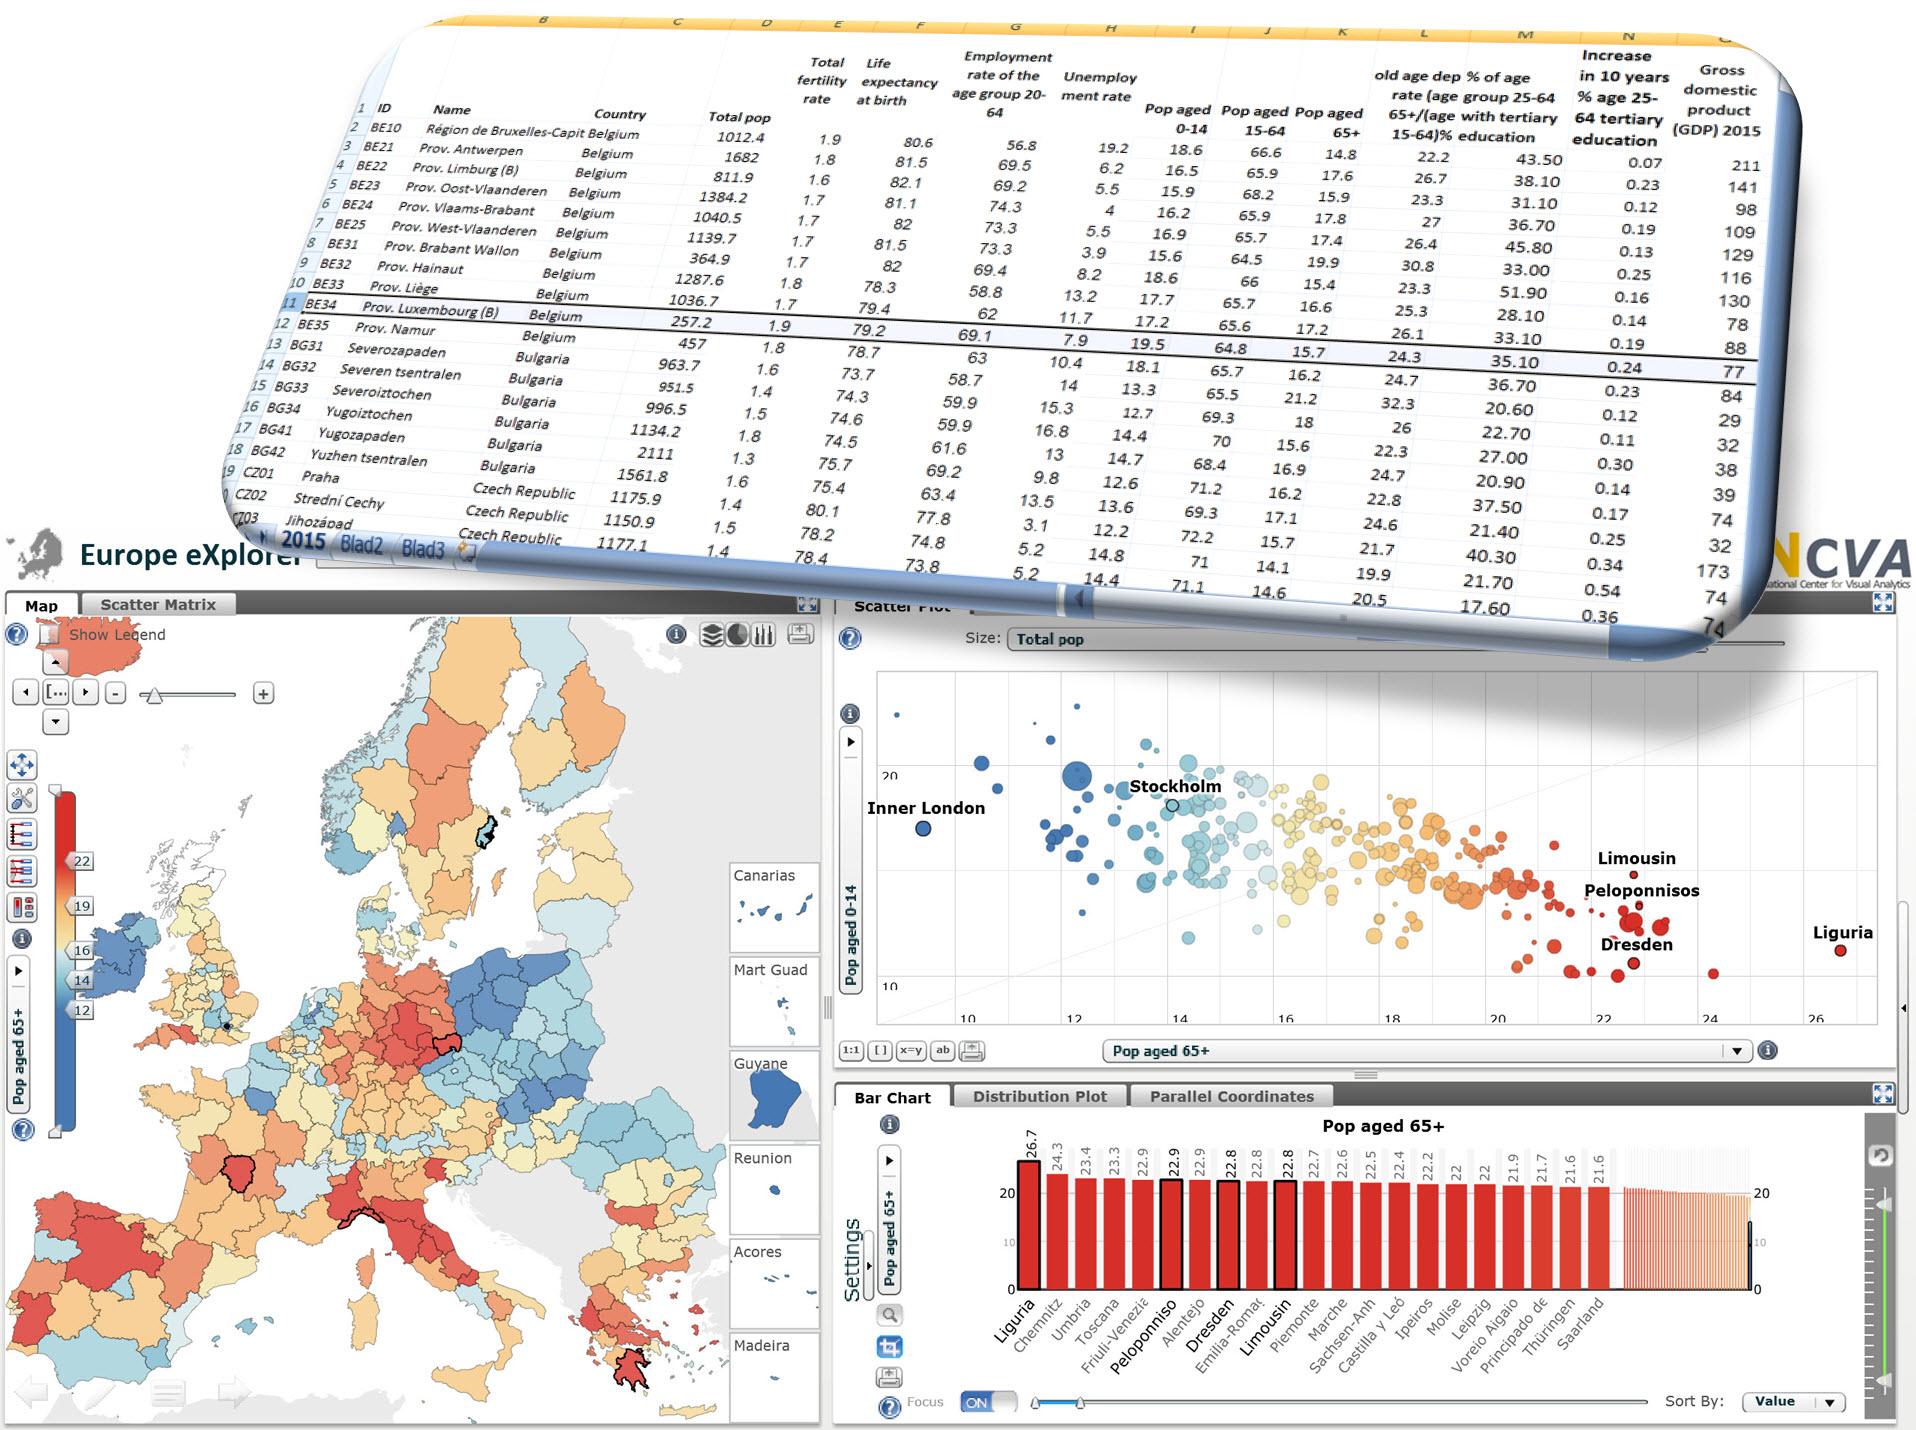 Europe eXplorer NUTS2